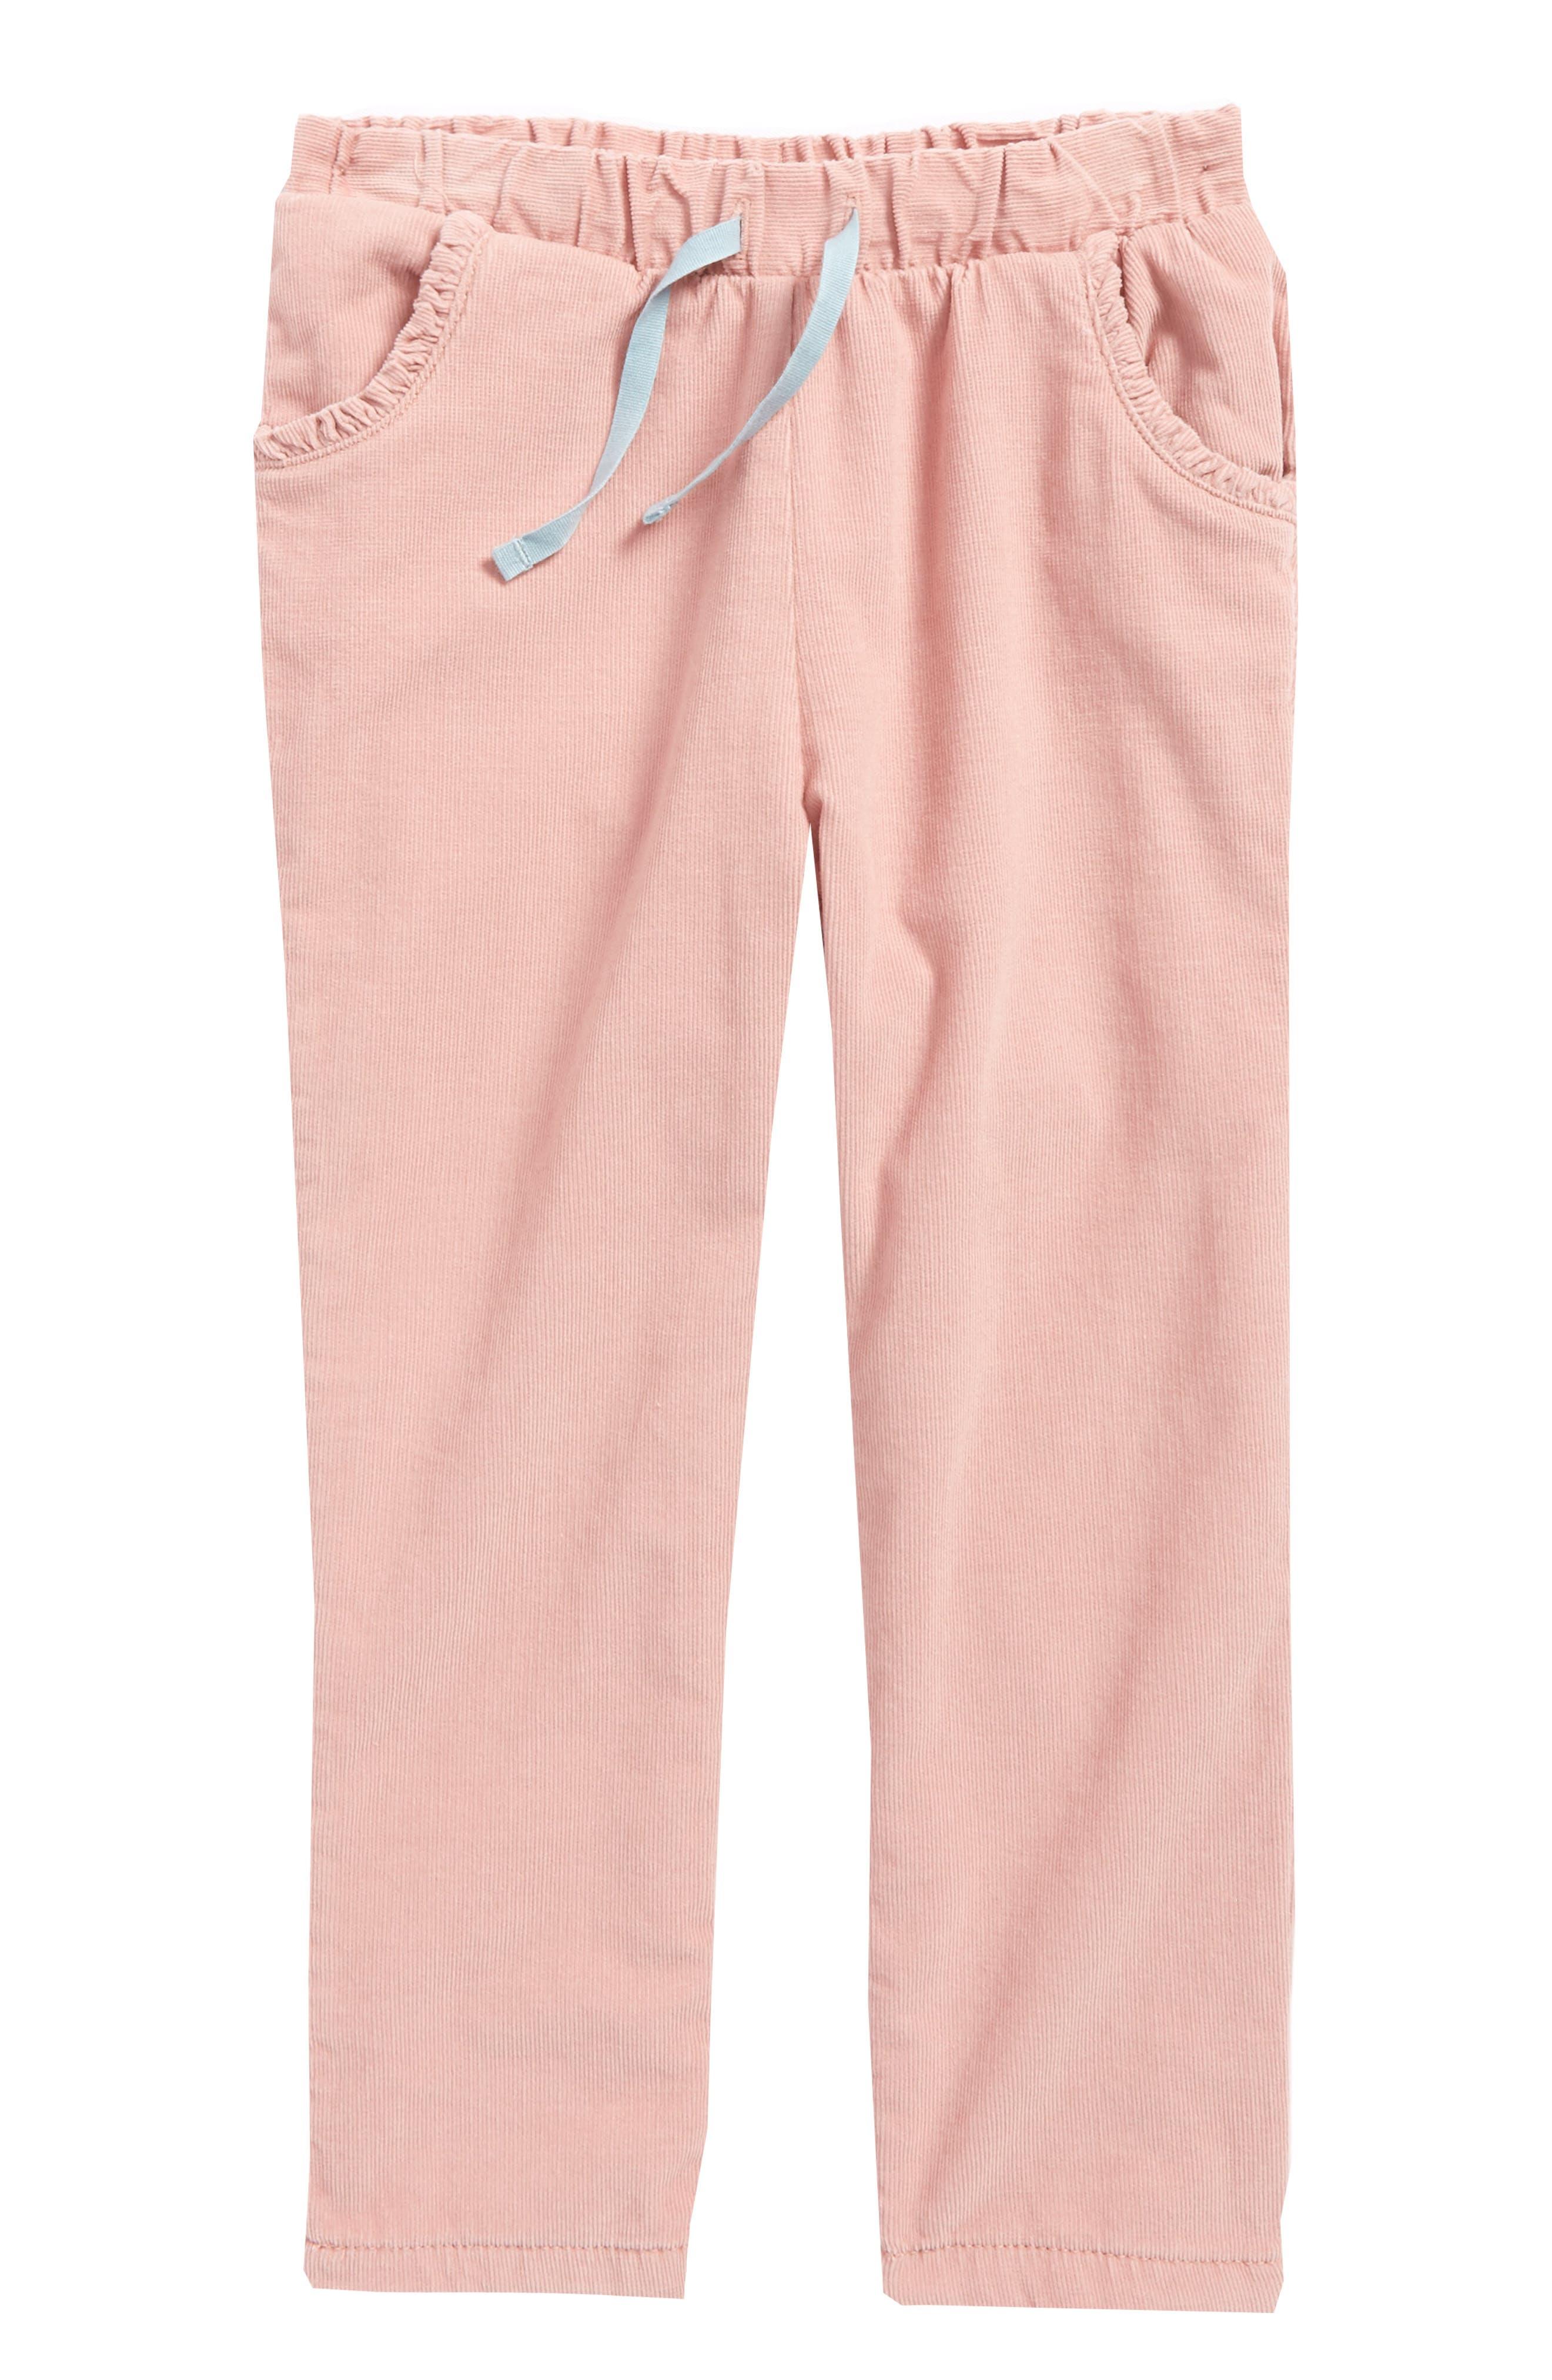 Heart Pocket Corduroy Pants,                         Main,                         color, Almond Blossom Pink